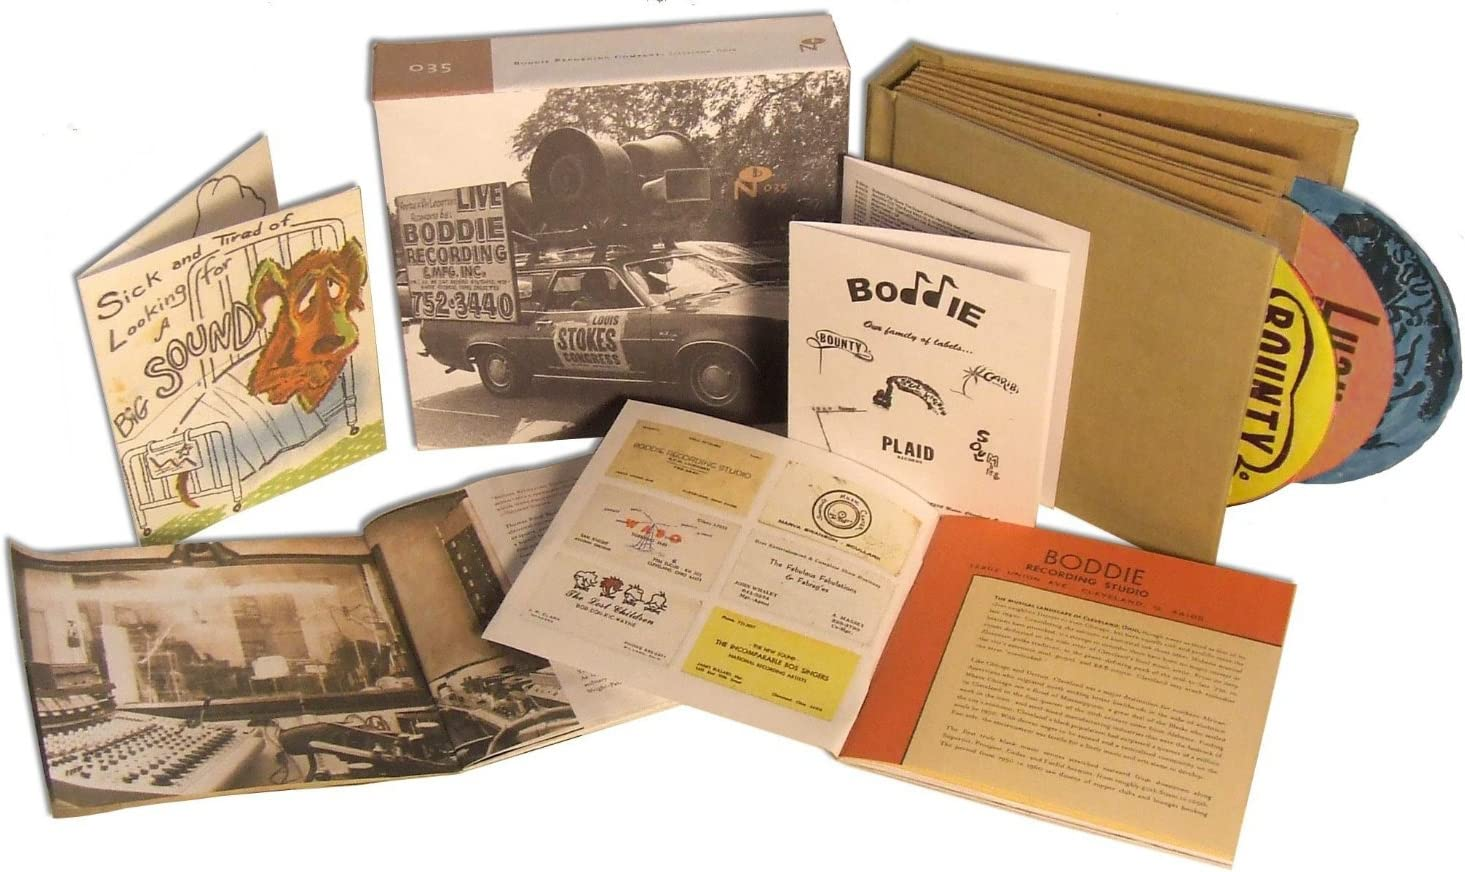 BODDIE RECORDING COMPANY: Amazon.co.uk: Music